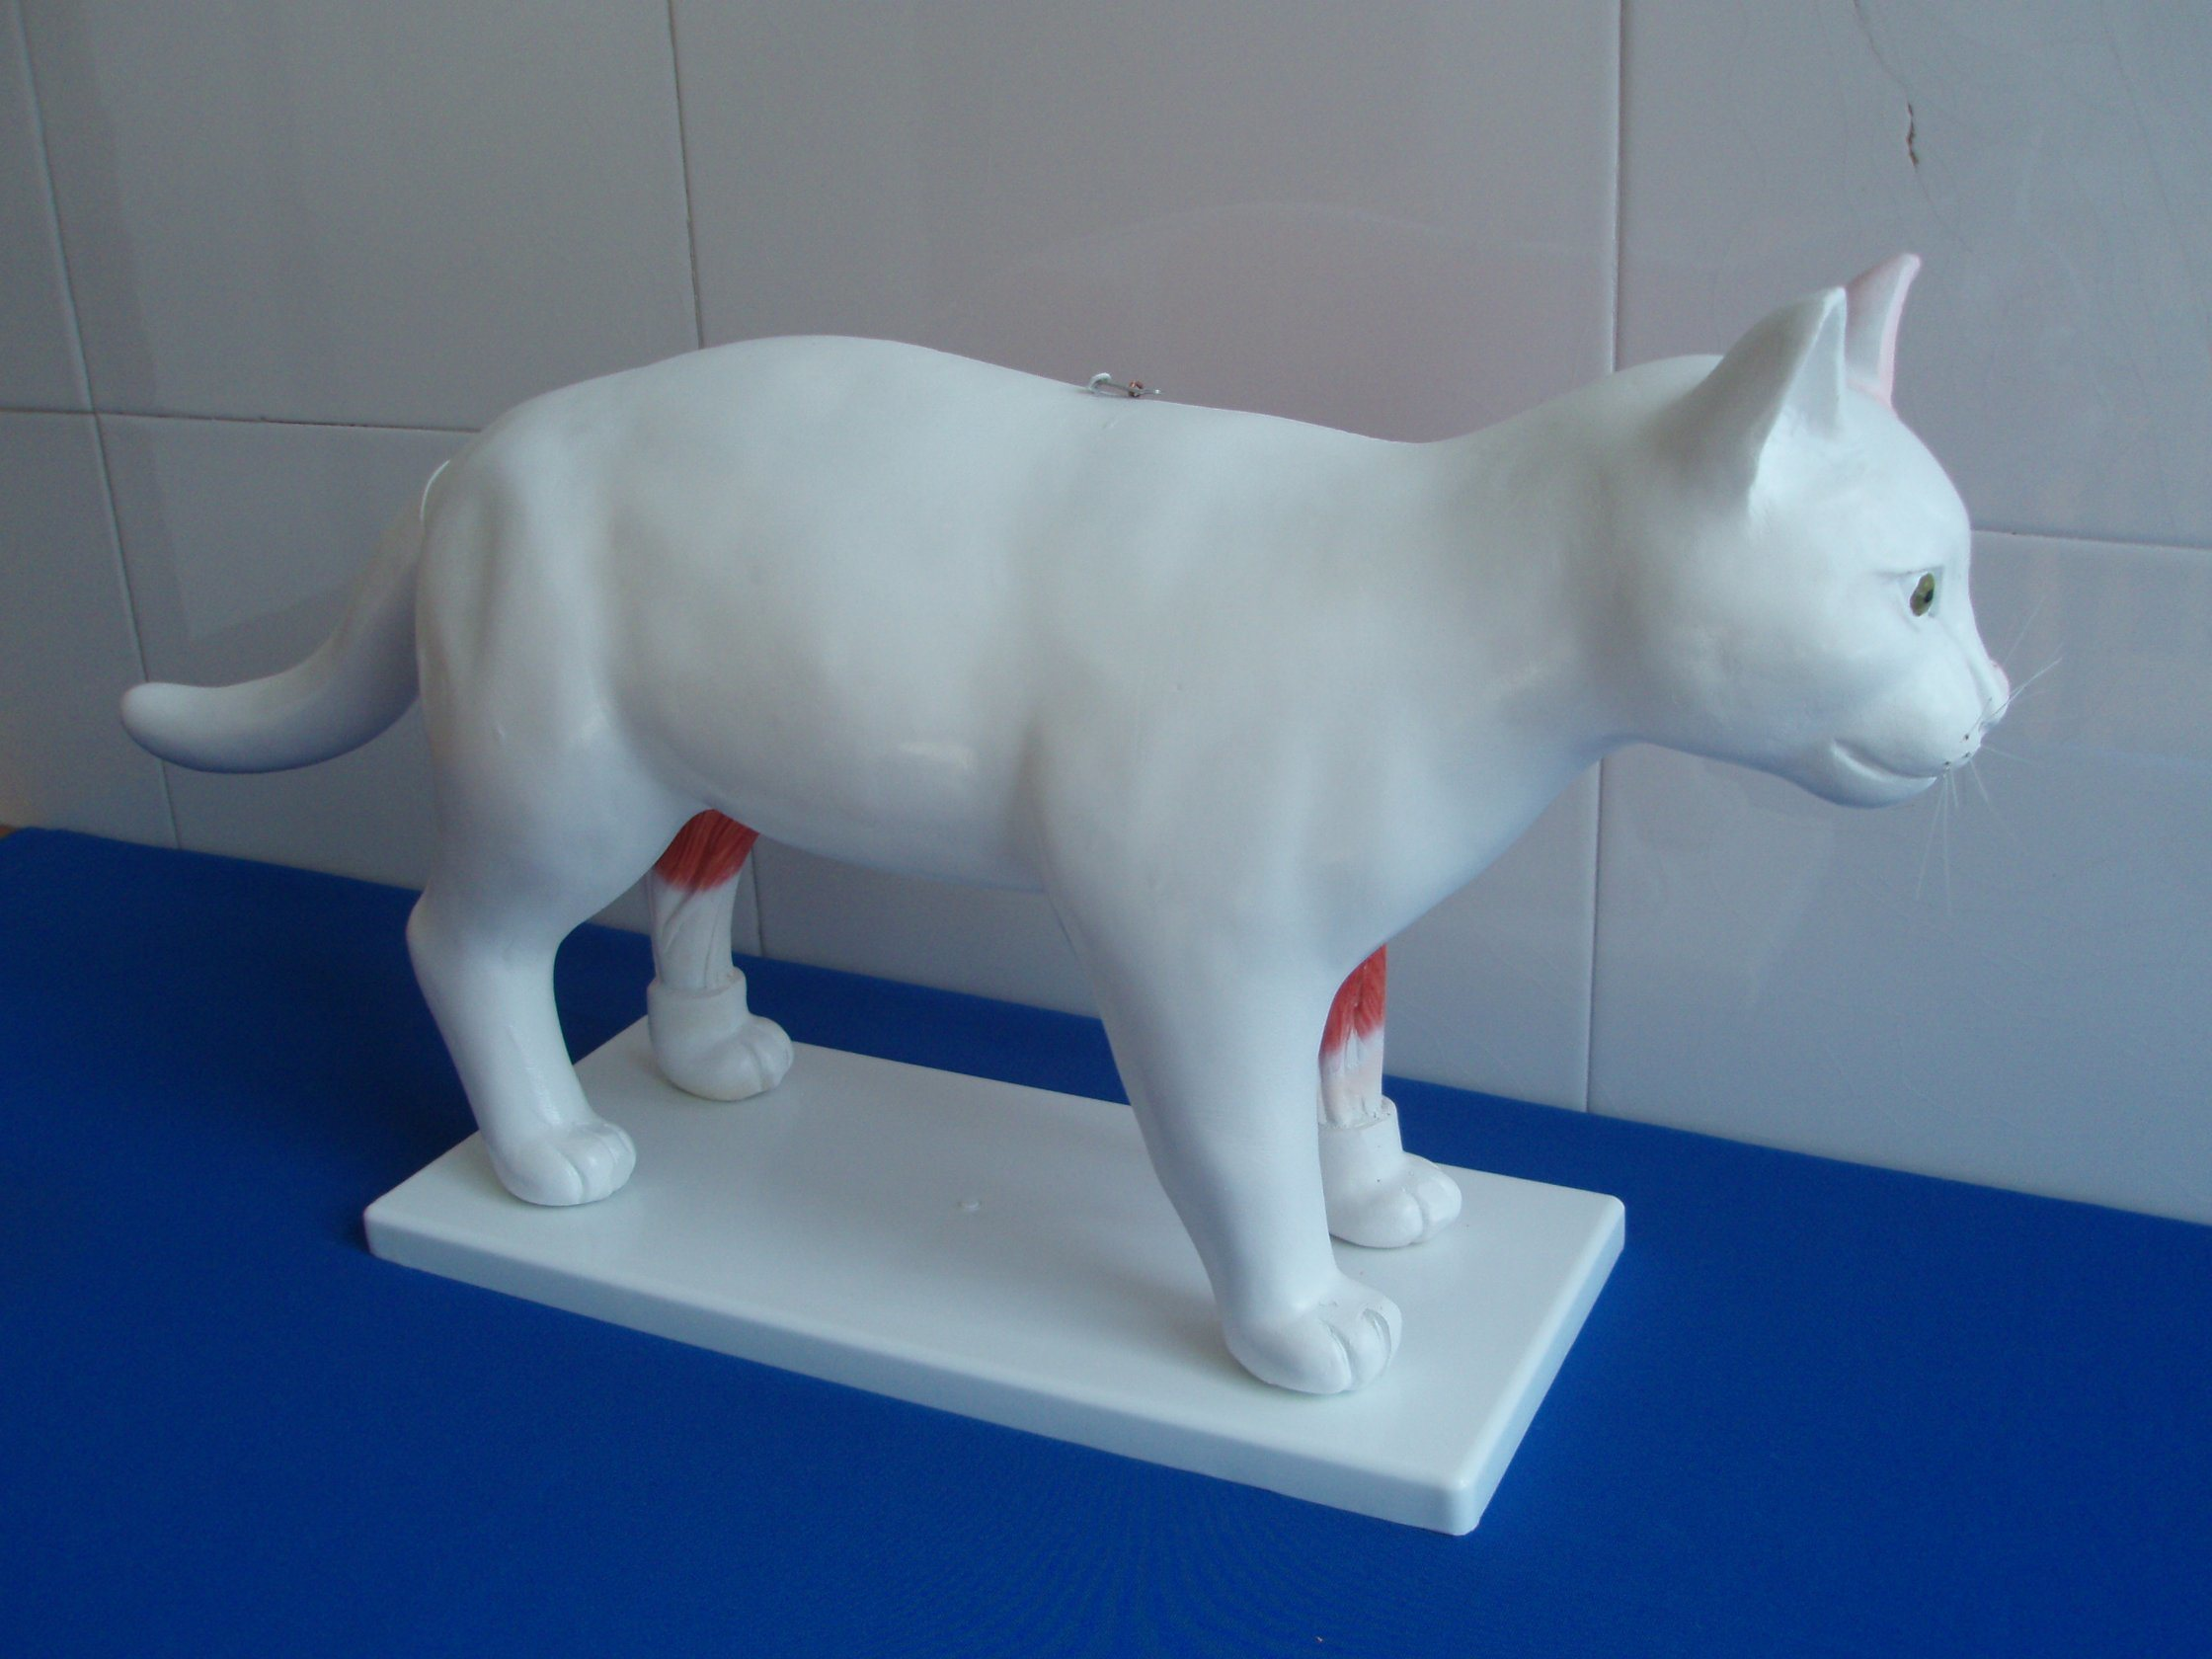 Glass Fiber Reinforced Plastics Cat Acpuncture Model